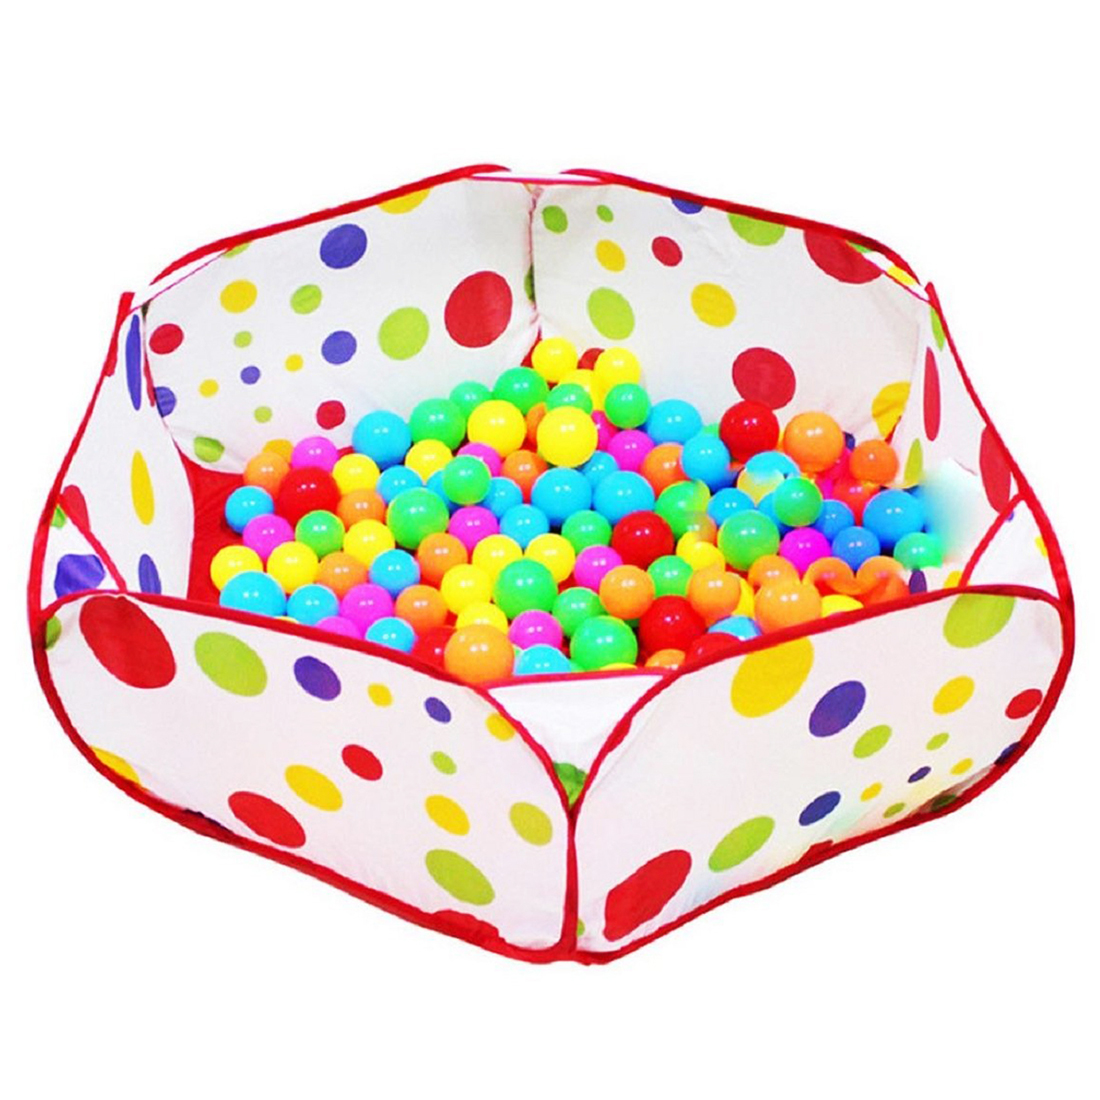 Pop up Hexagon Polka Dot Kids Ball Play Pool Tent Carry Tote Toy +50 Balls